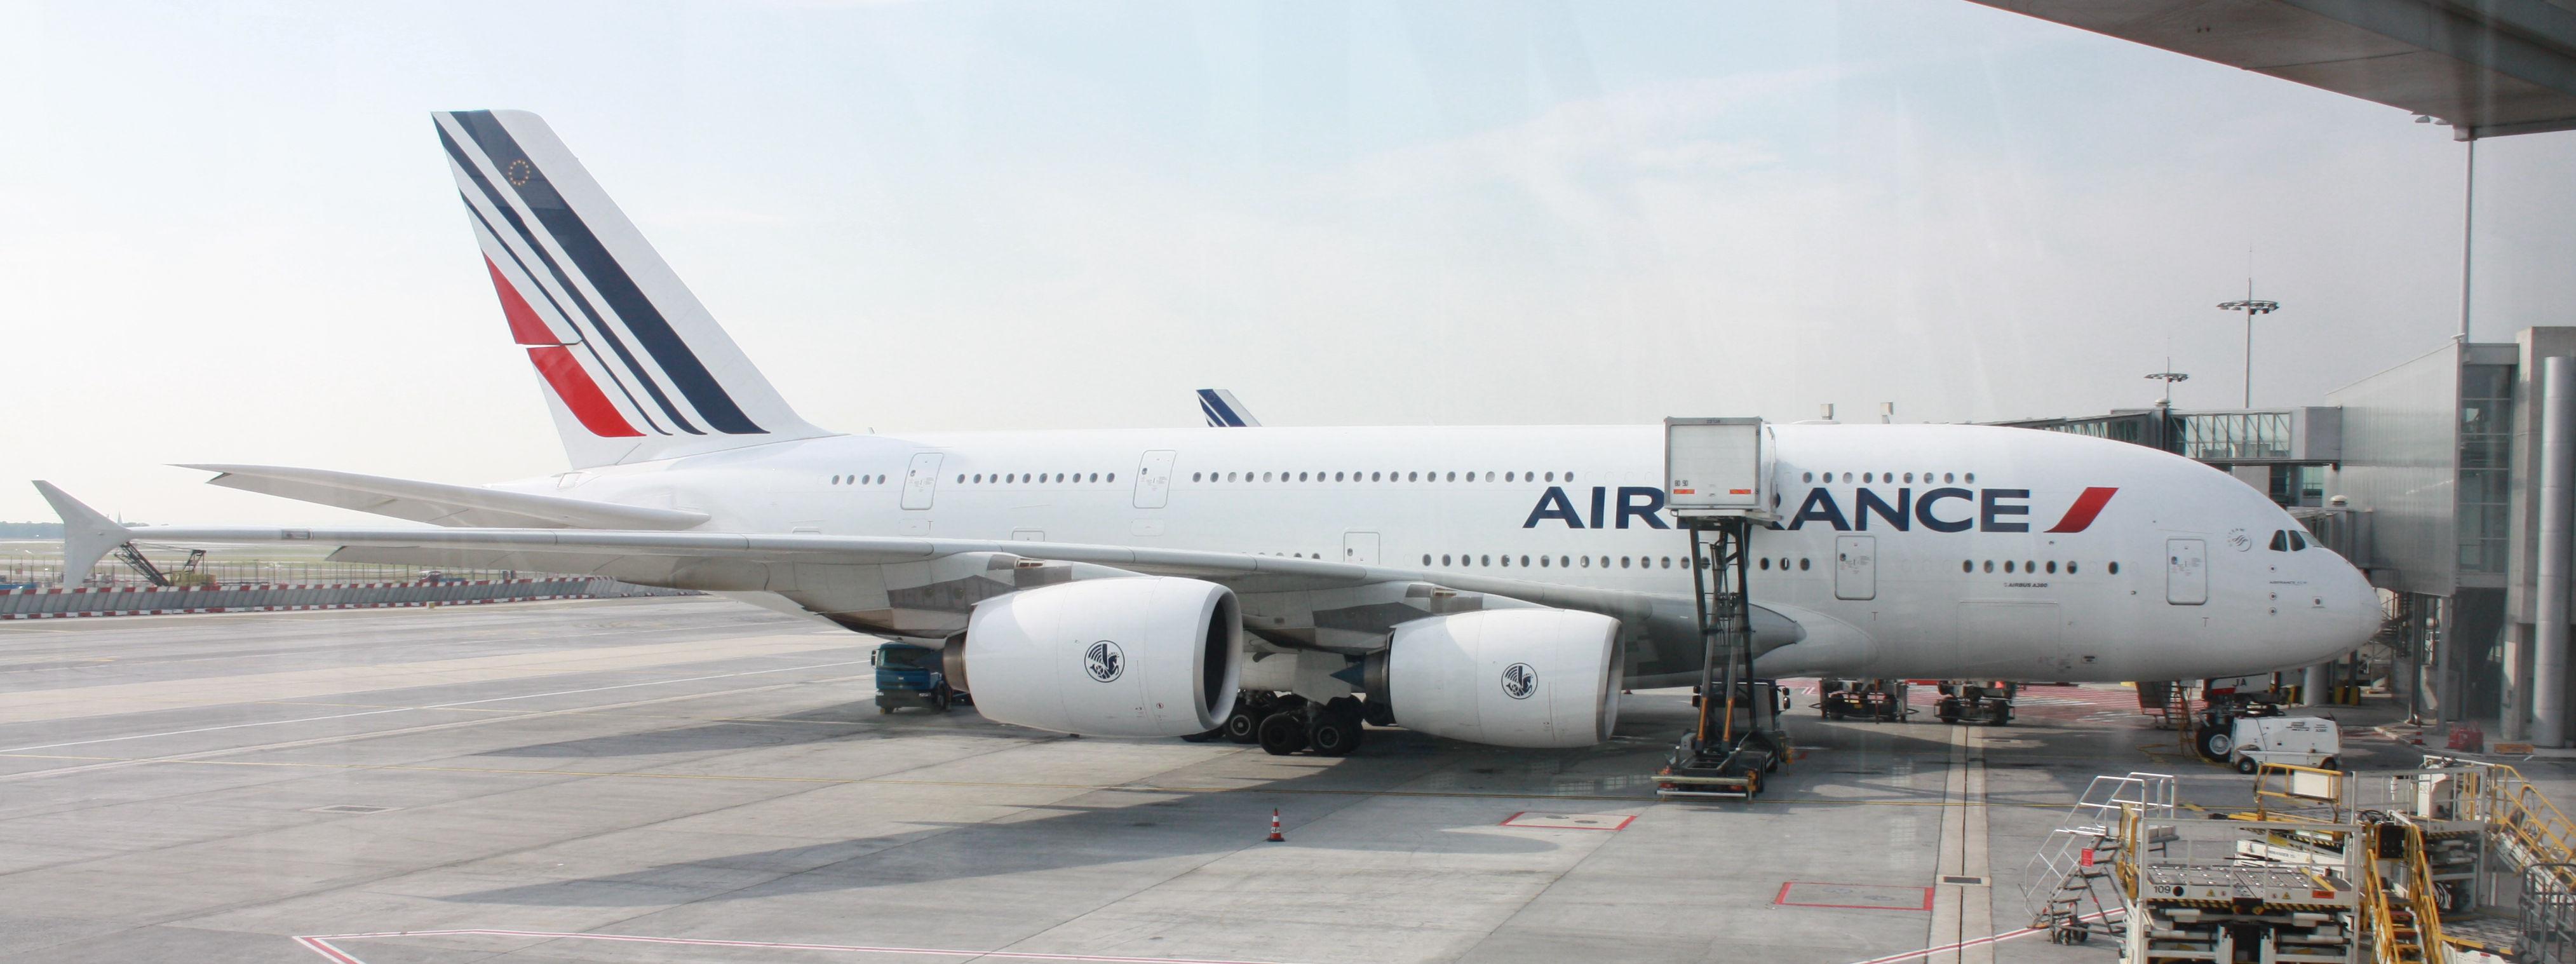 File:A380 Air France F-HPJA - CDG.jpg - Wikimedia Commons